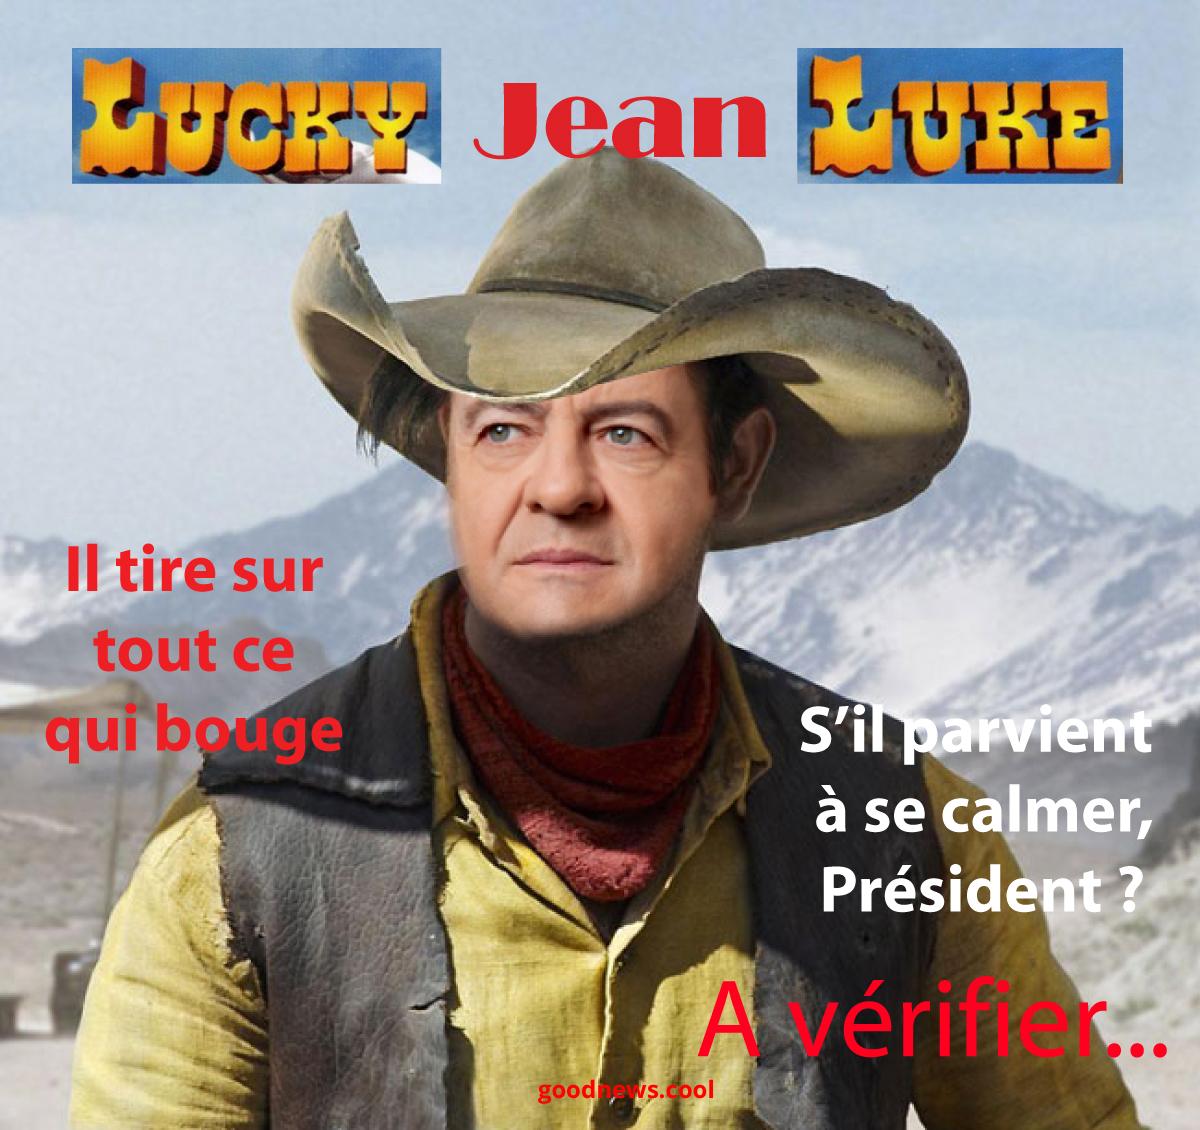 Jean Luc MELANCHON